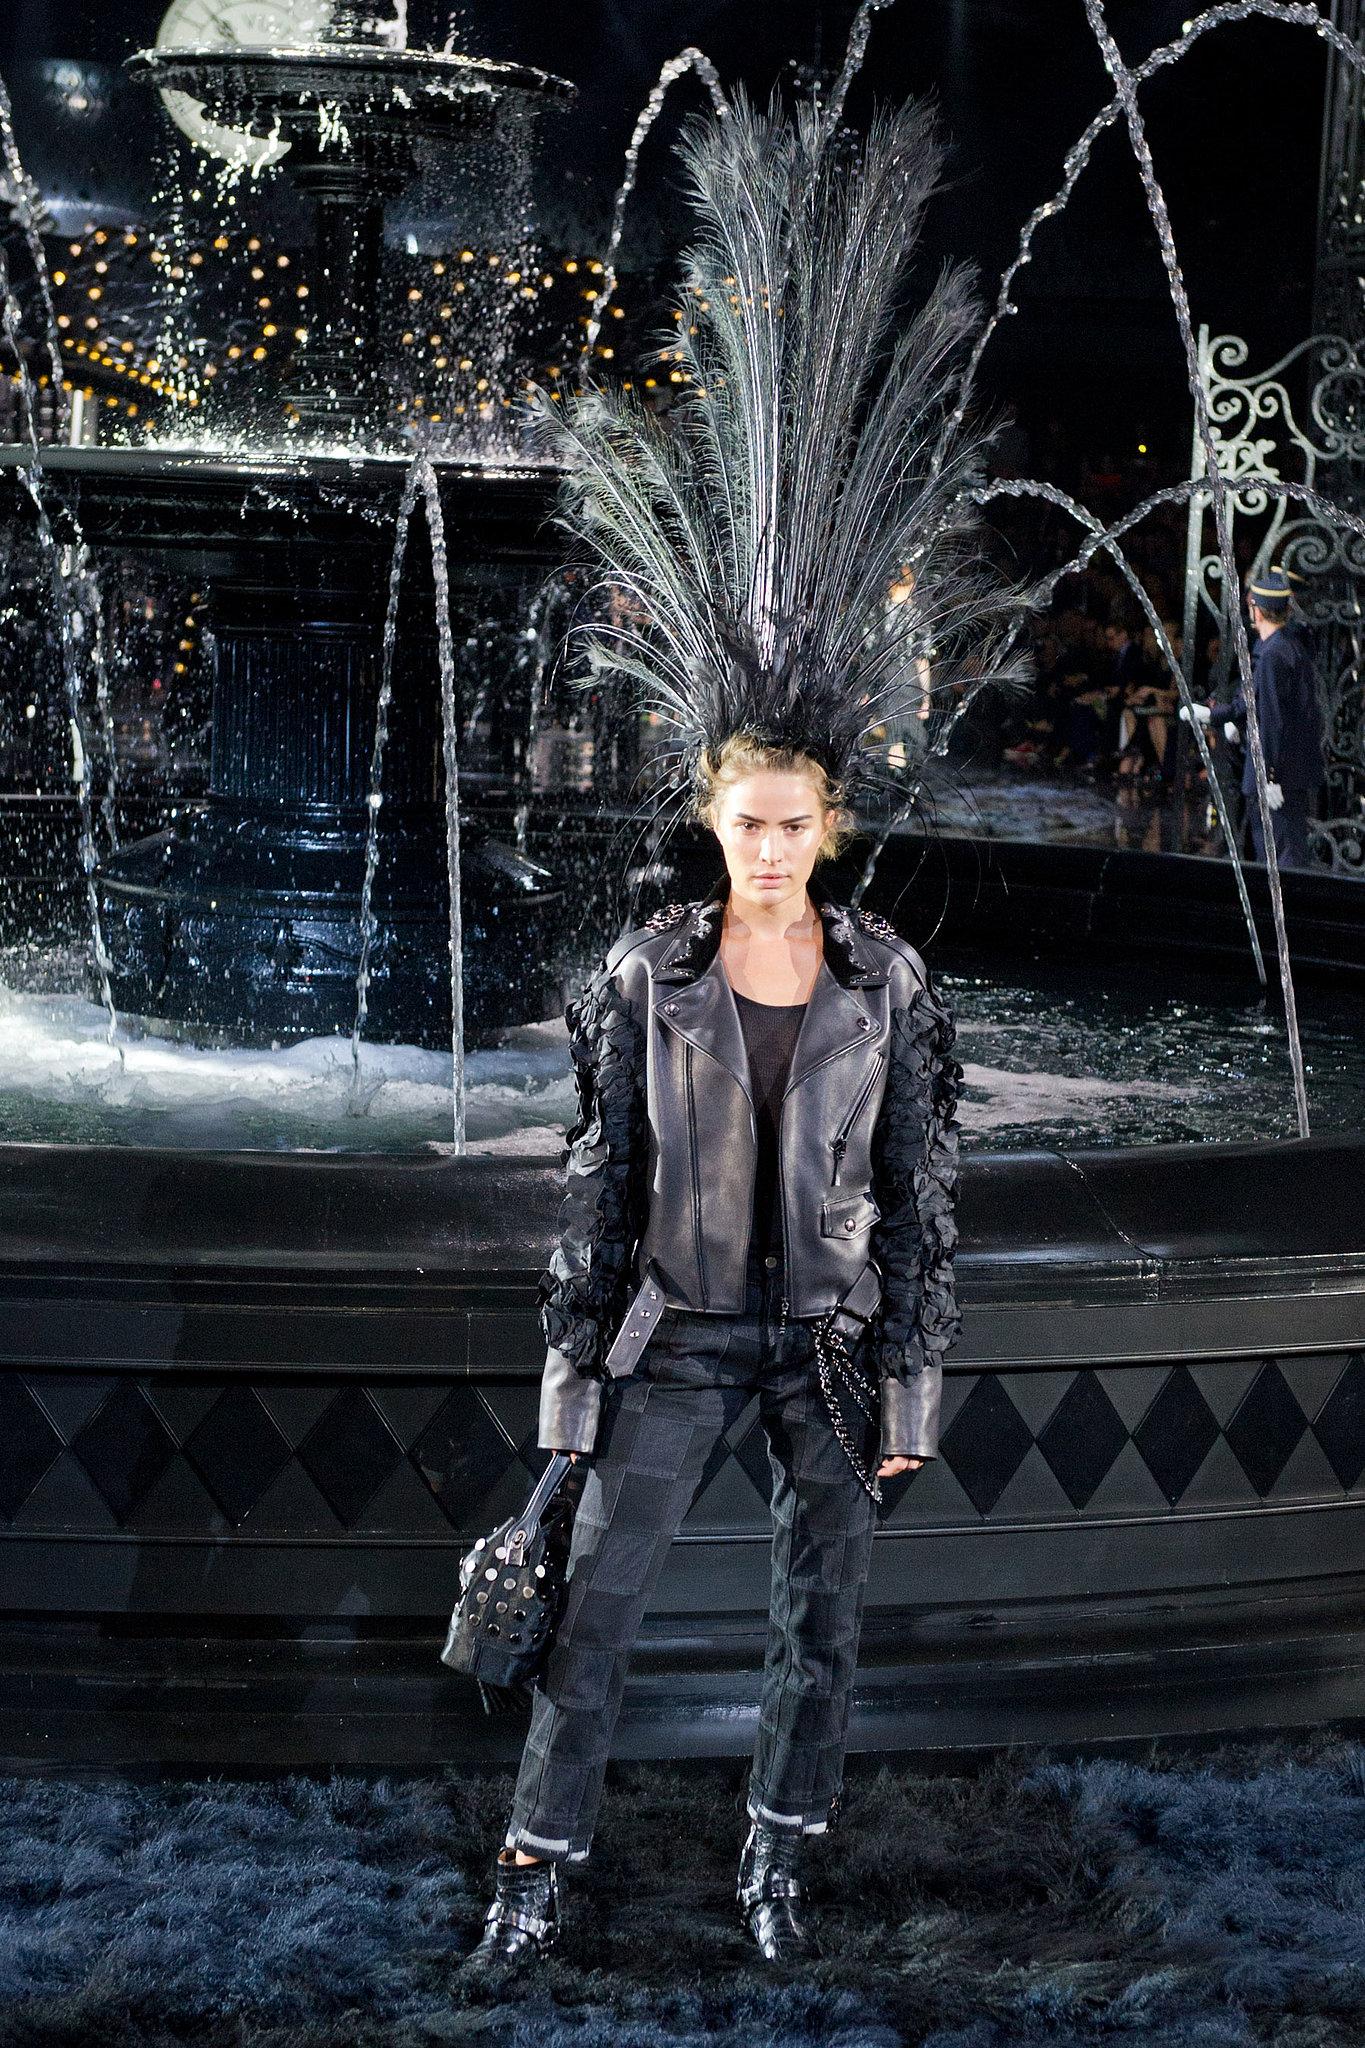 Louis Vuitton Spring 2014: Marc Jacobs Fades to Black - 1365 x 2048  909kb  jpg